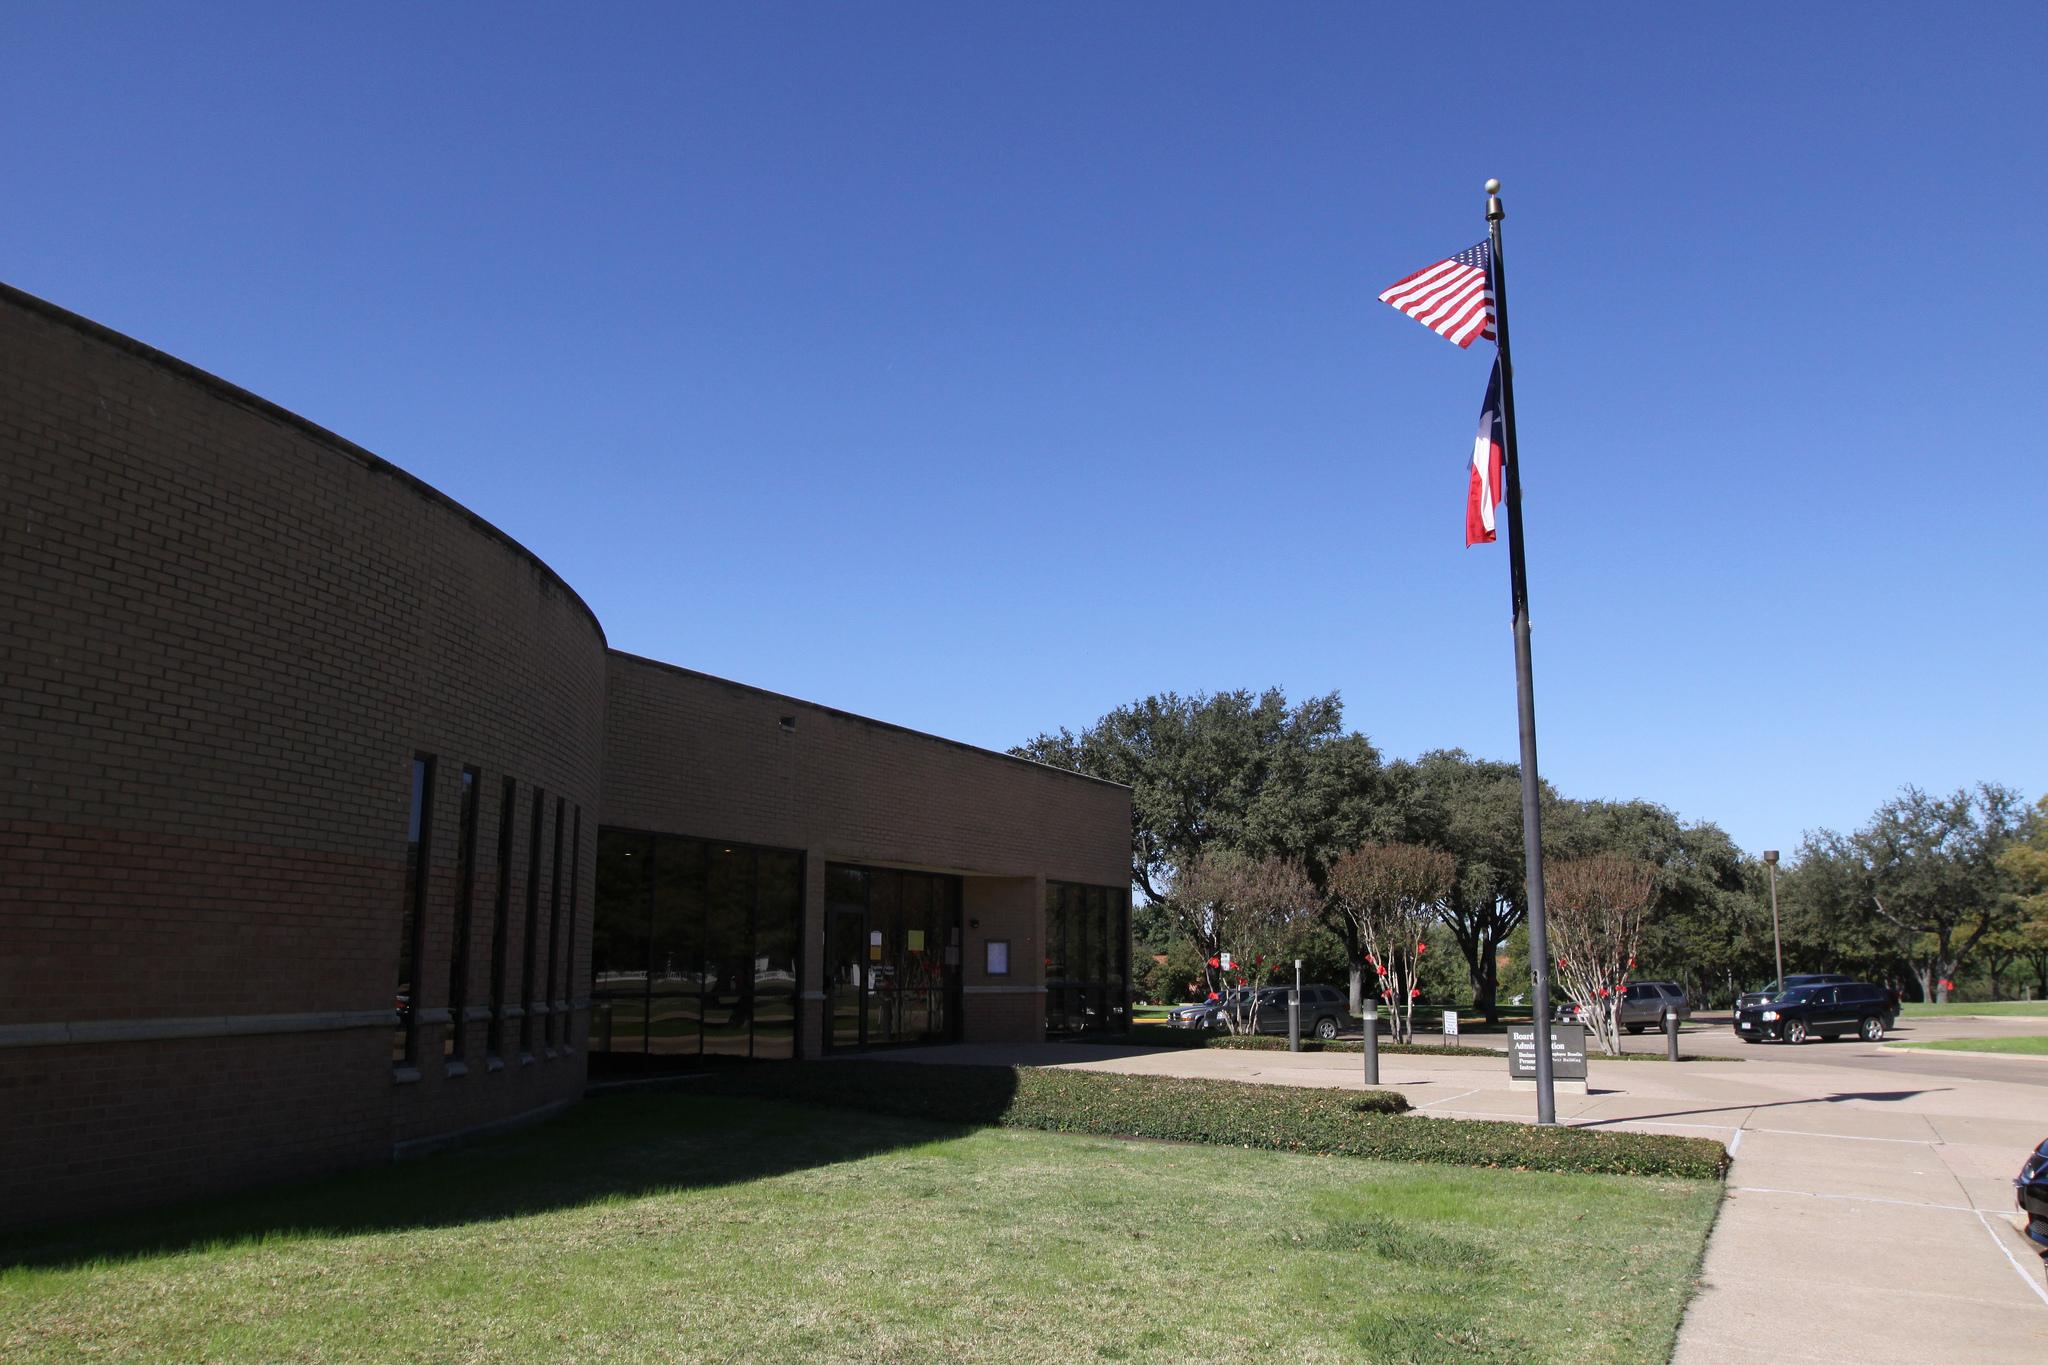 Carrollton Elementary